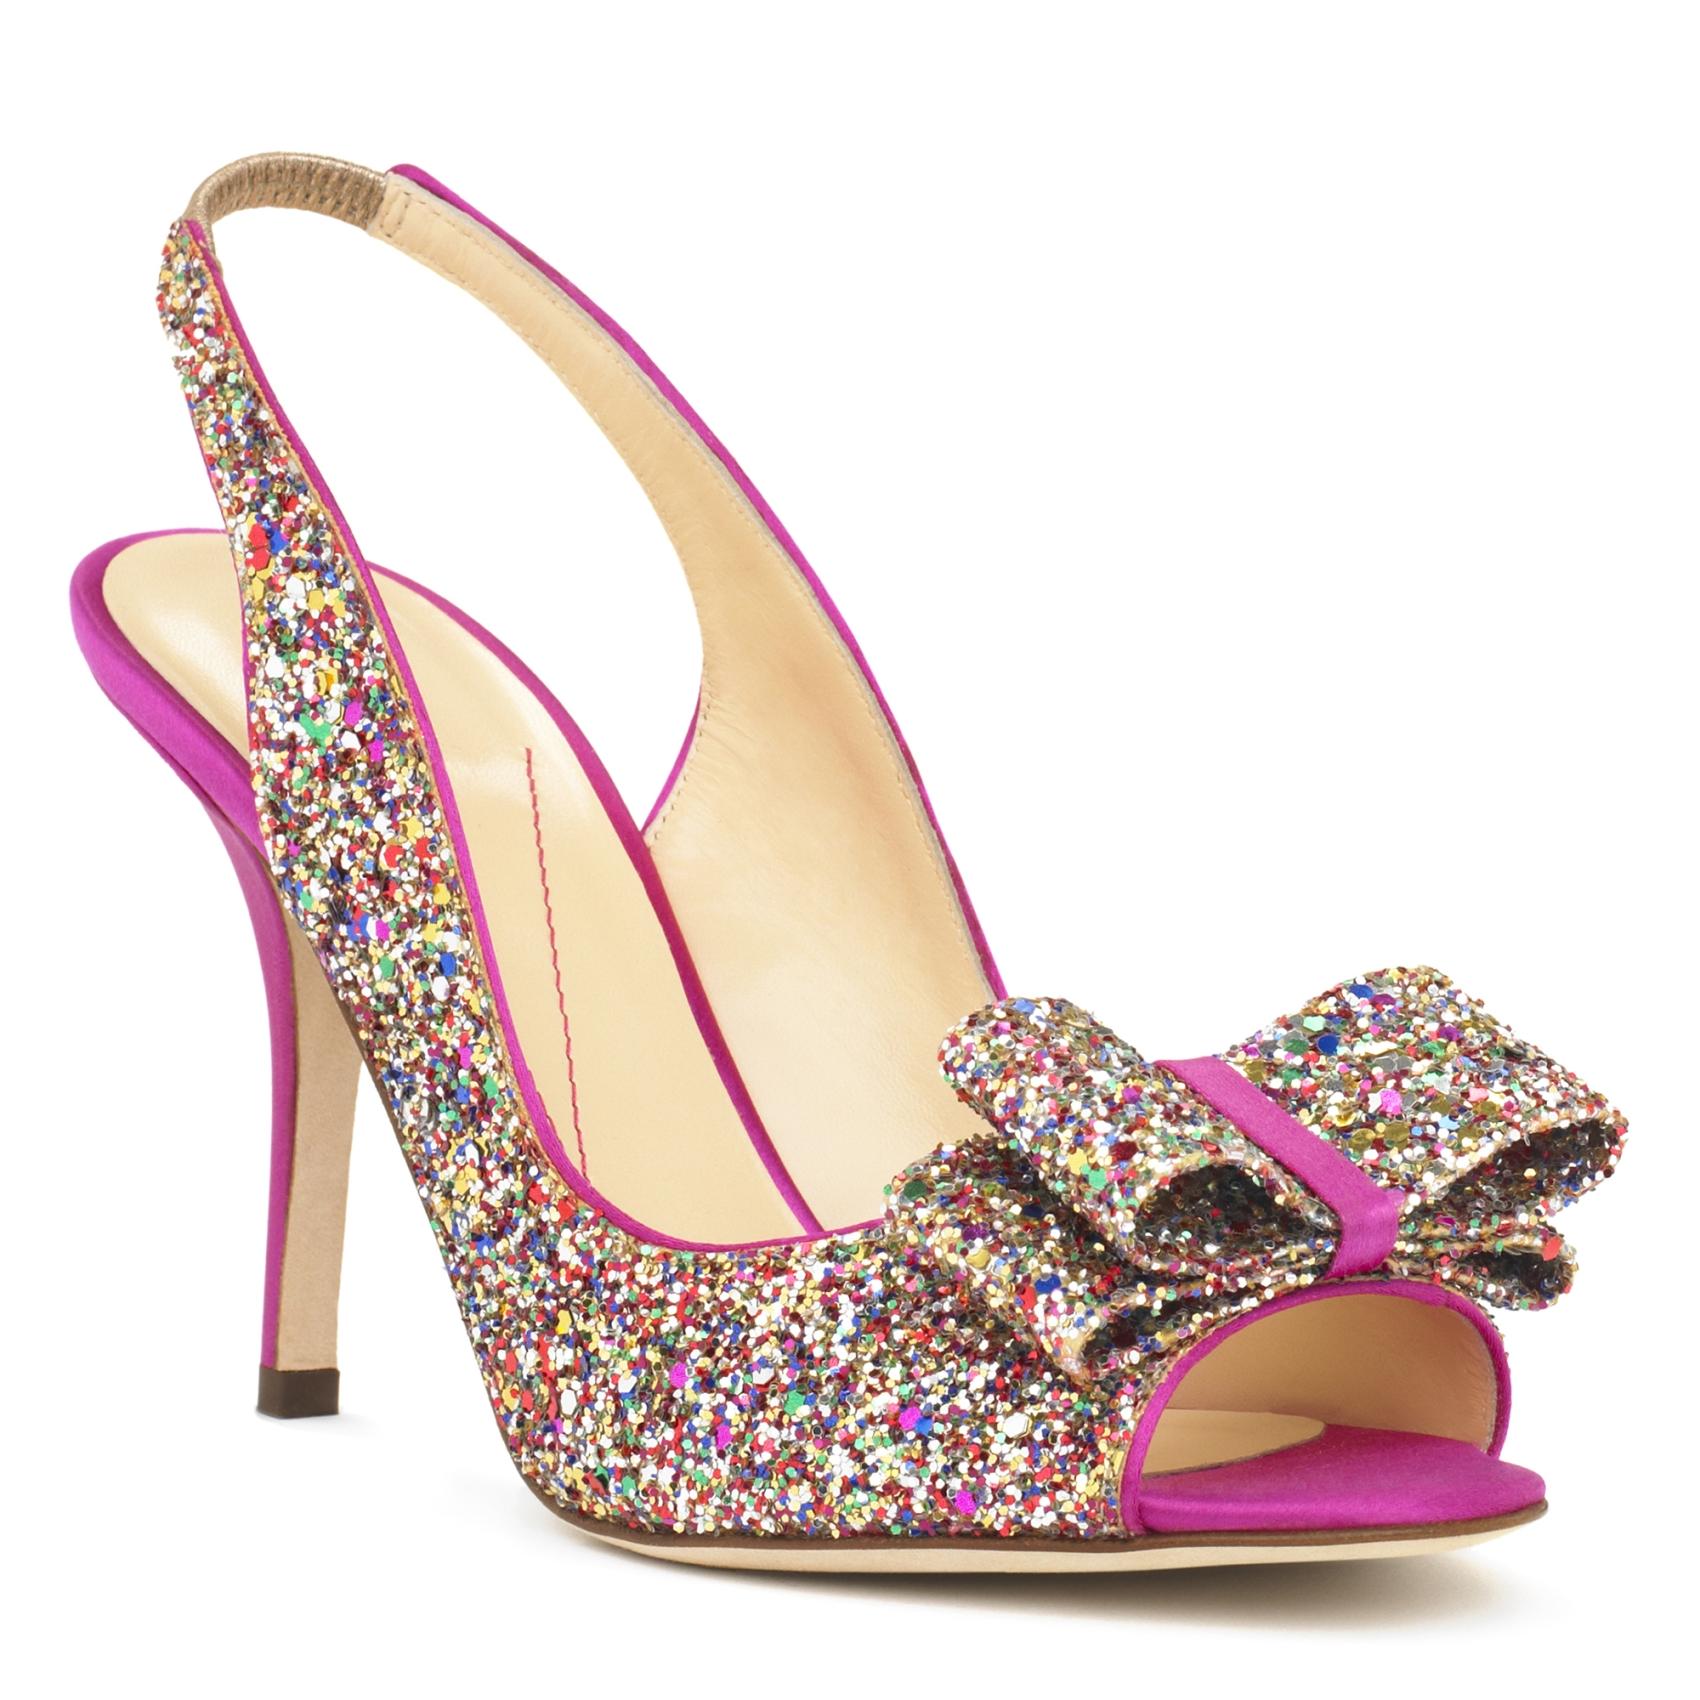 Pencil-Heel-Shoes-design-10